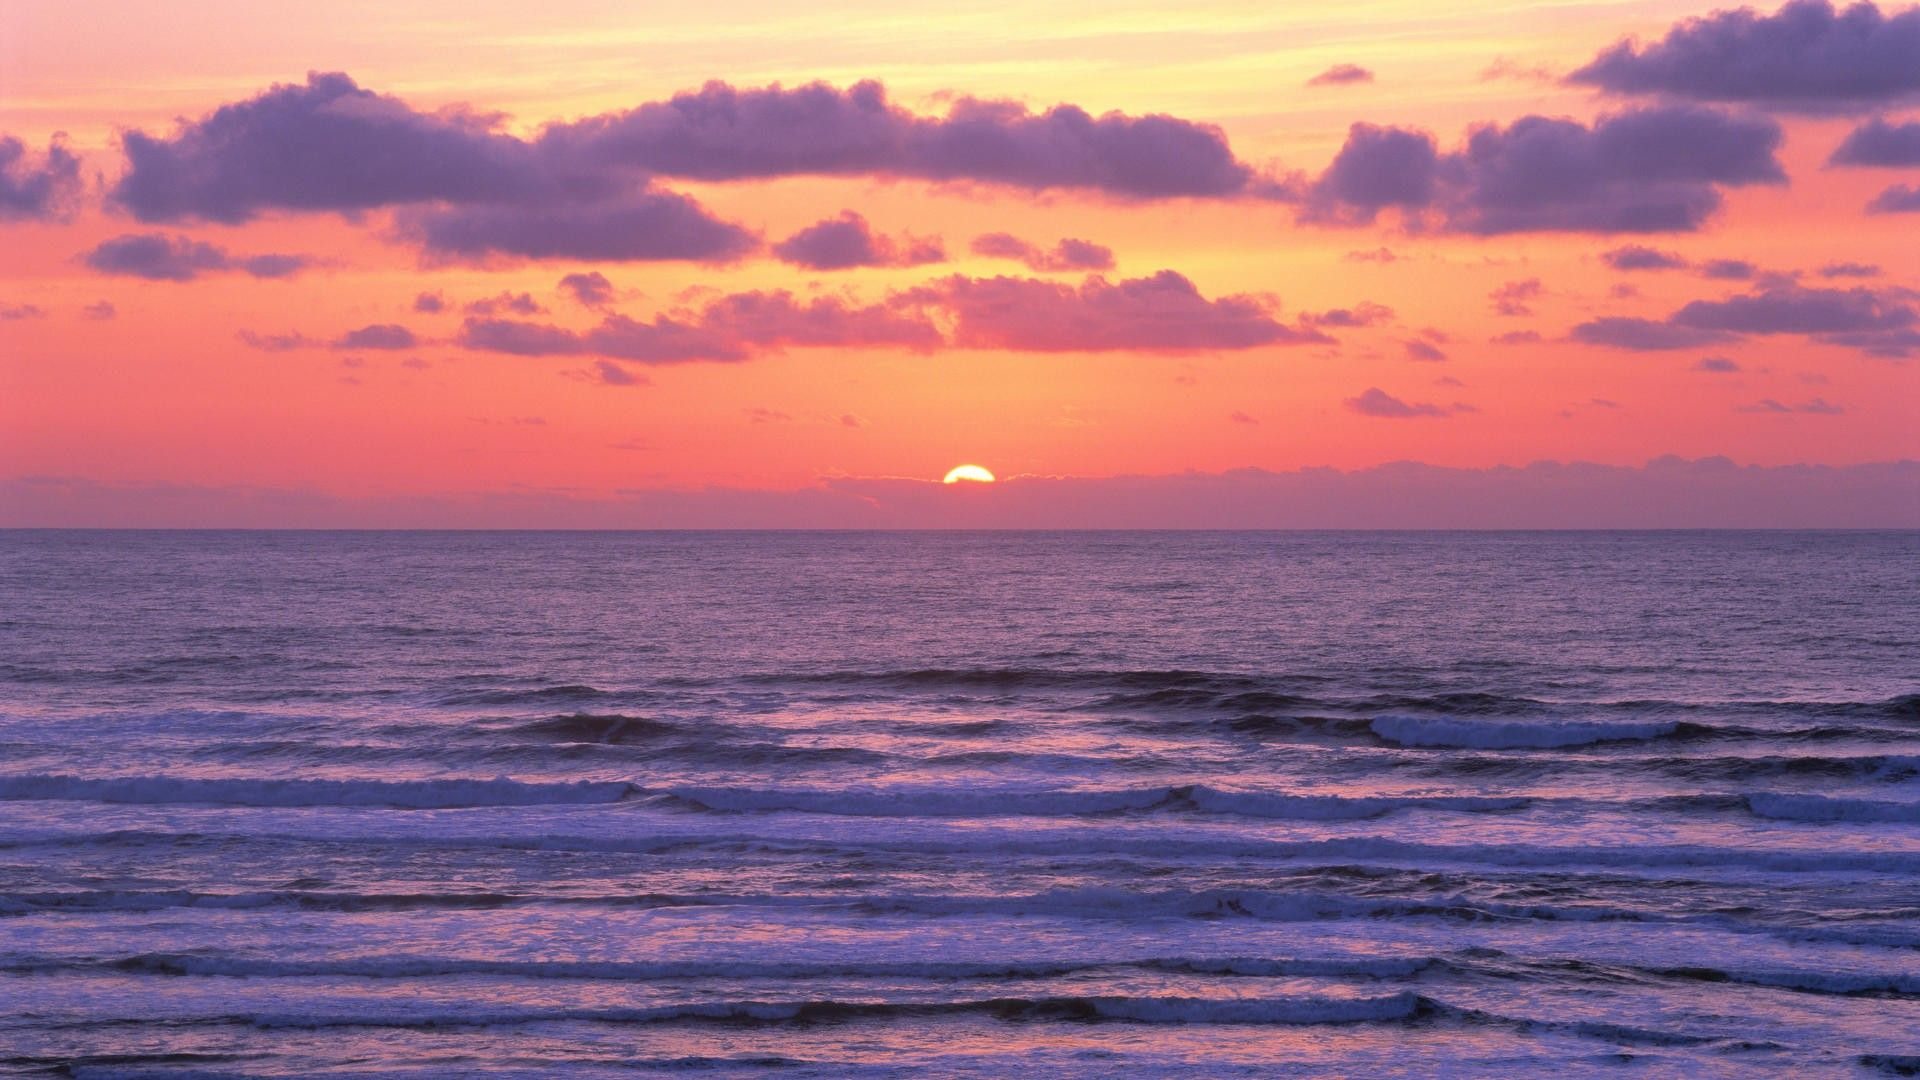 Purple Sunset Wallpaper 6807143 With Images Ocean Landscape Ocean Sunset Sunset Background